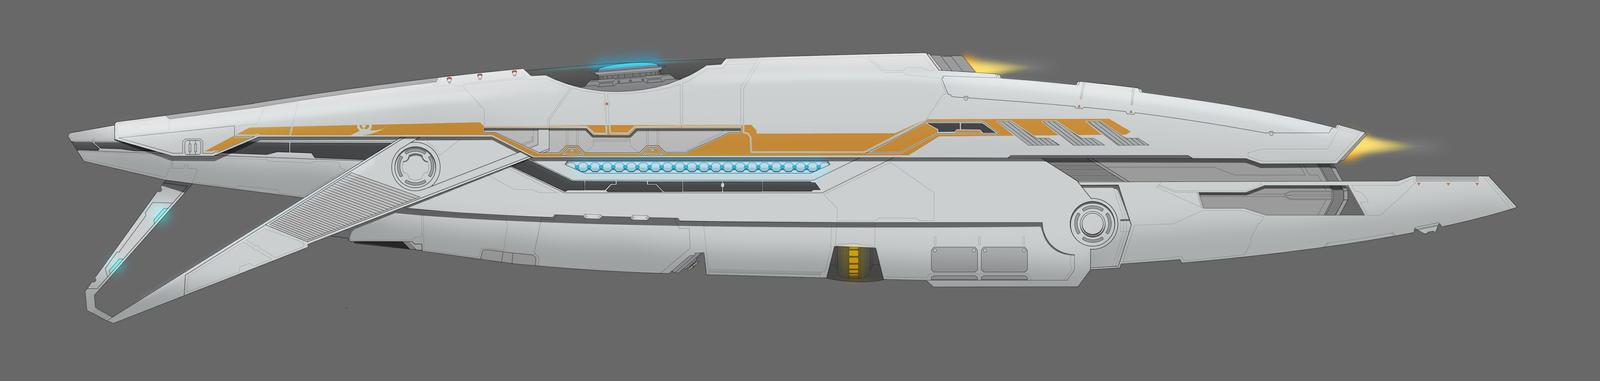 Sci-Fi Explorer by AdamKop